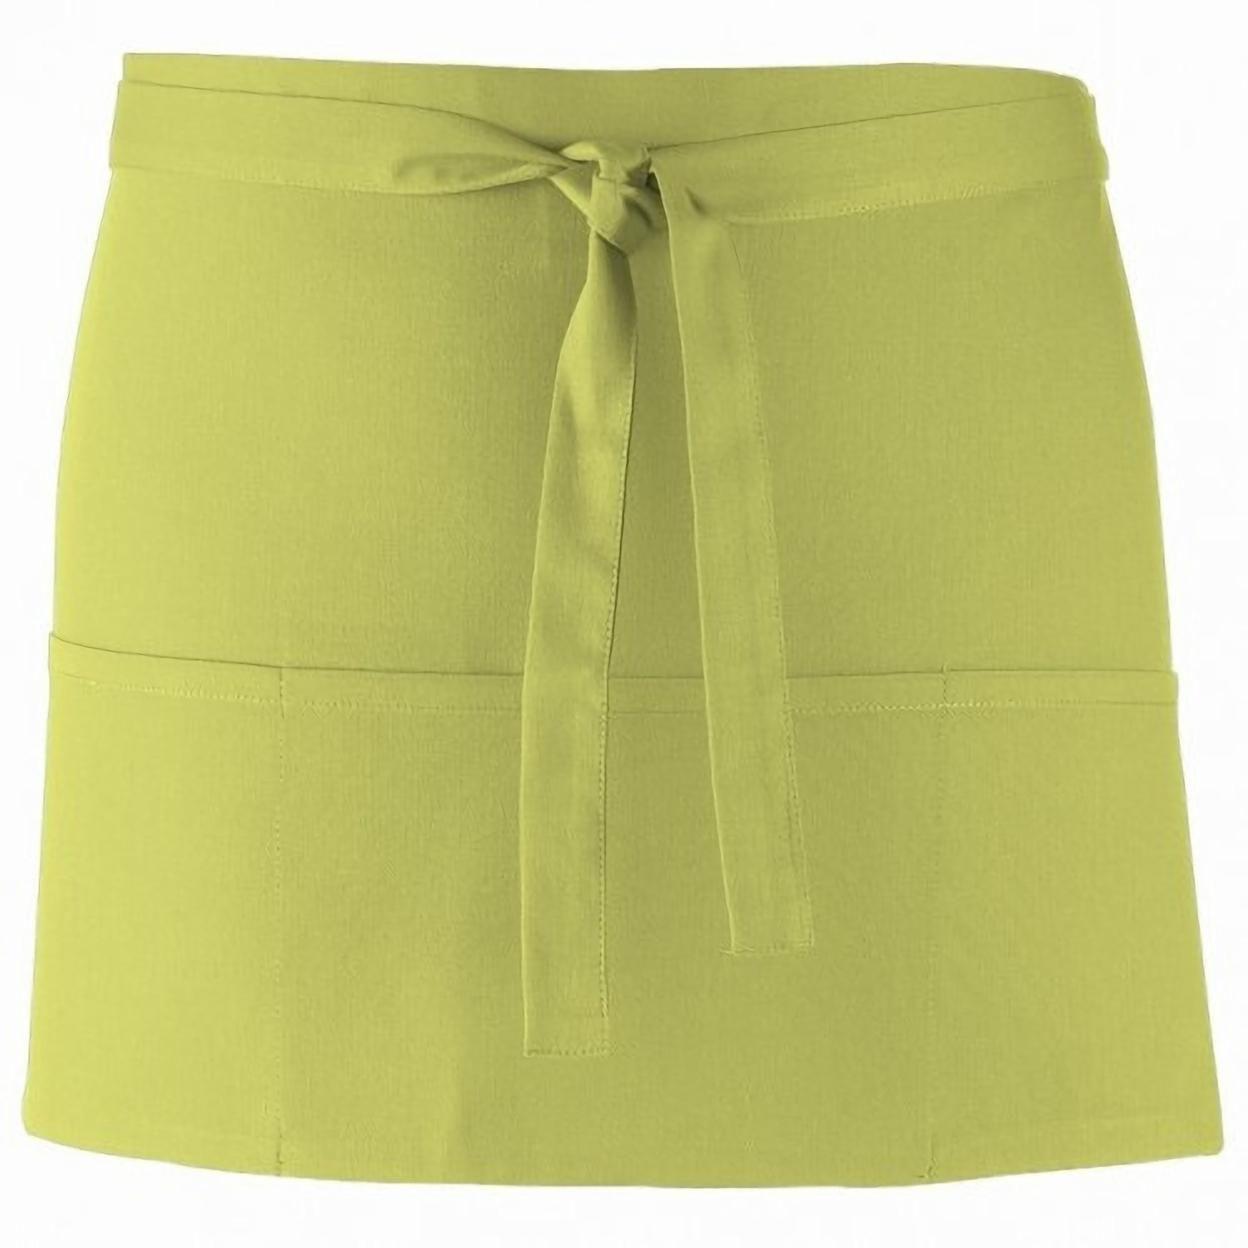 Premier Ladies/Womens Colors 3 Pocket Apron / Workwear Size One Size